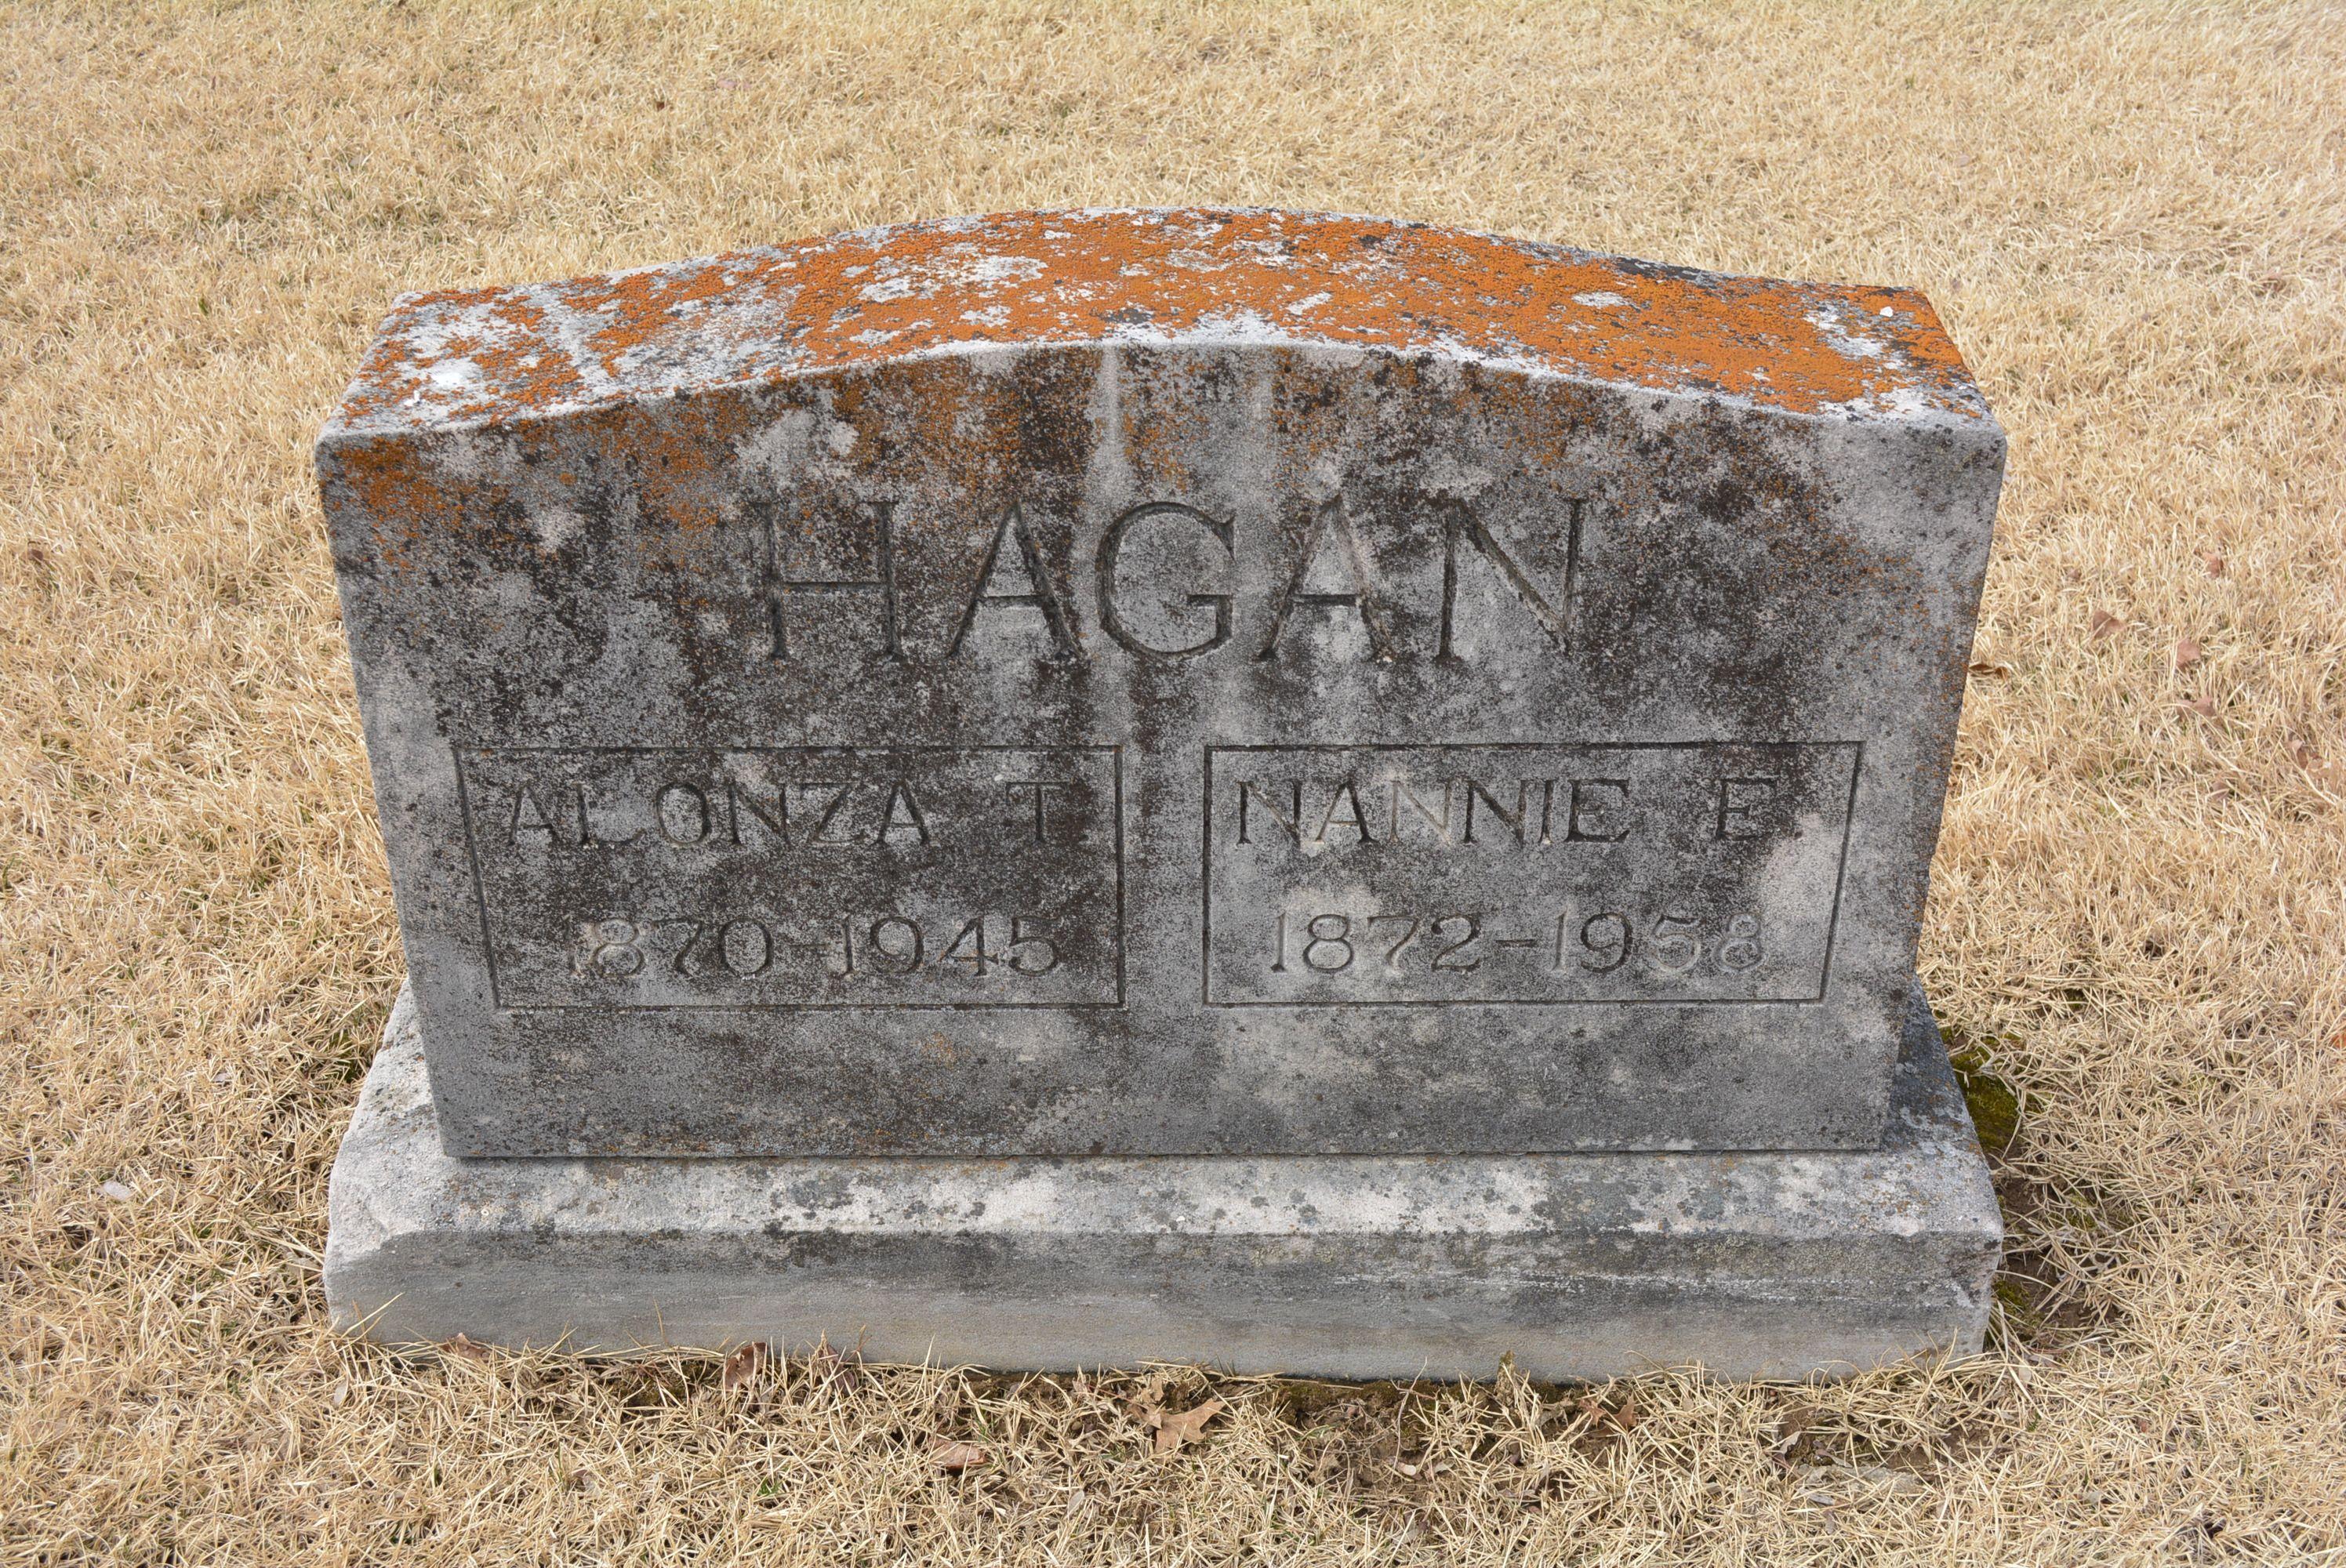 Alonza Thomas Lon Hagan